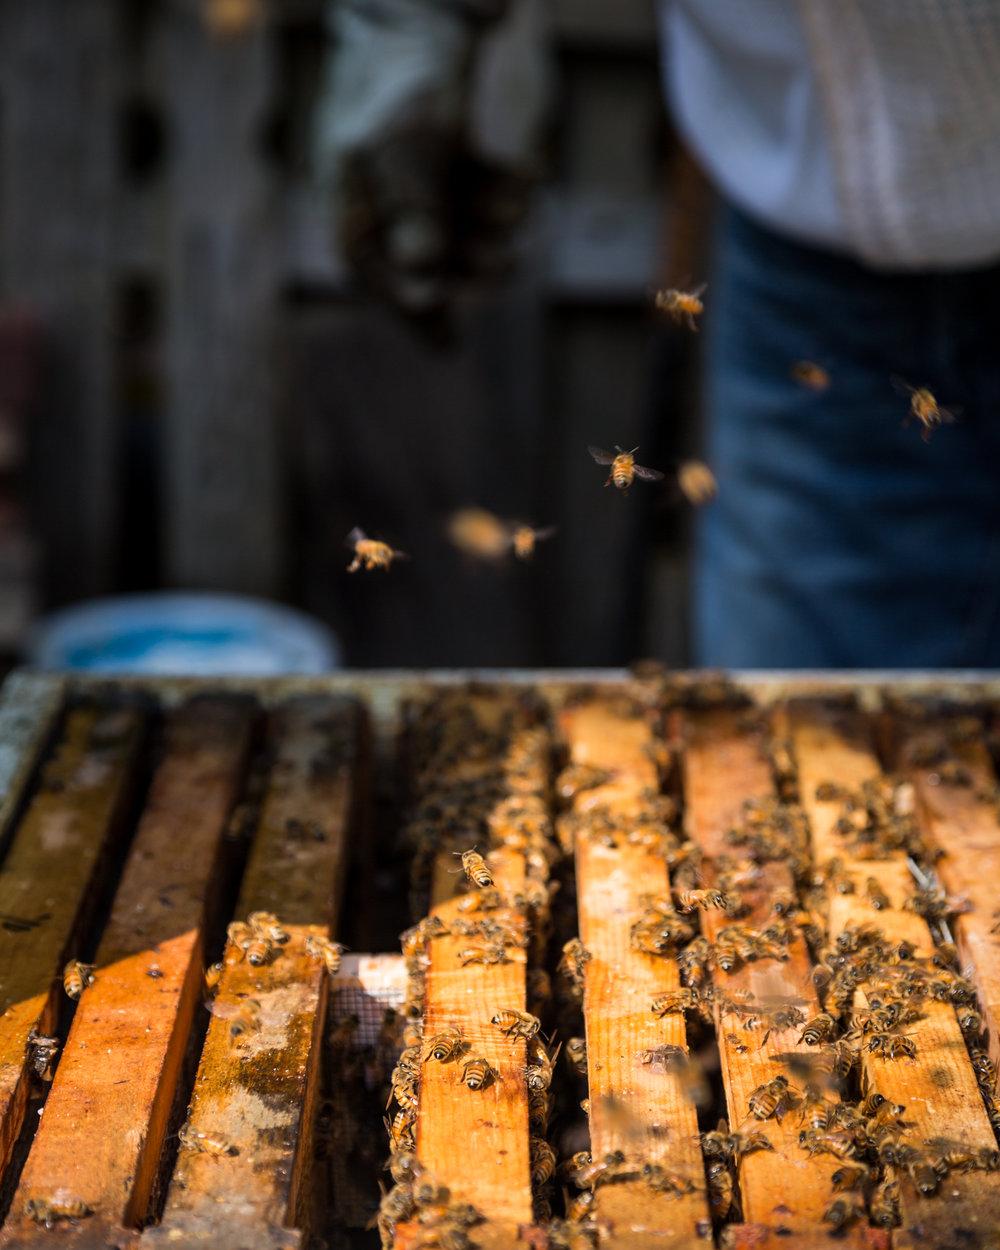 Beekeeper-17.jpg